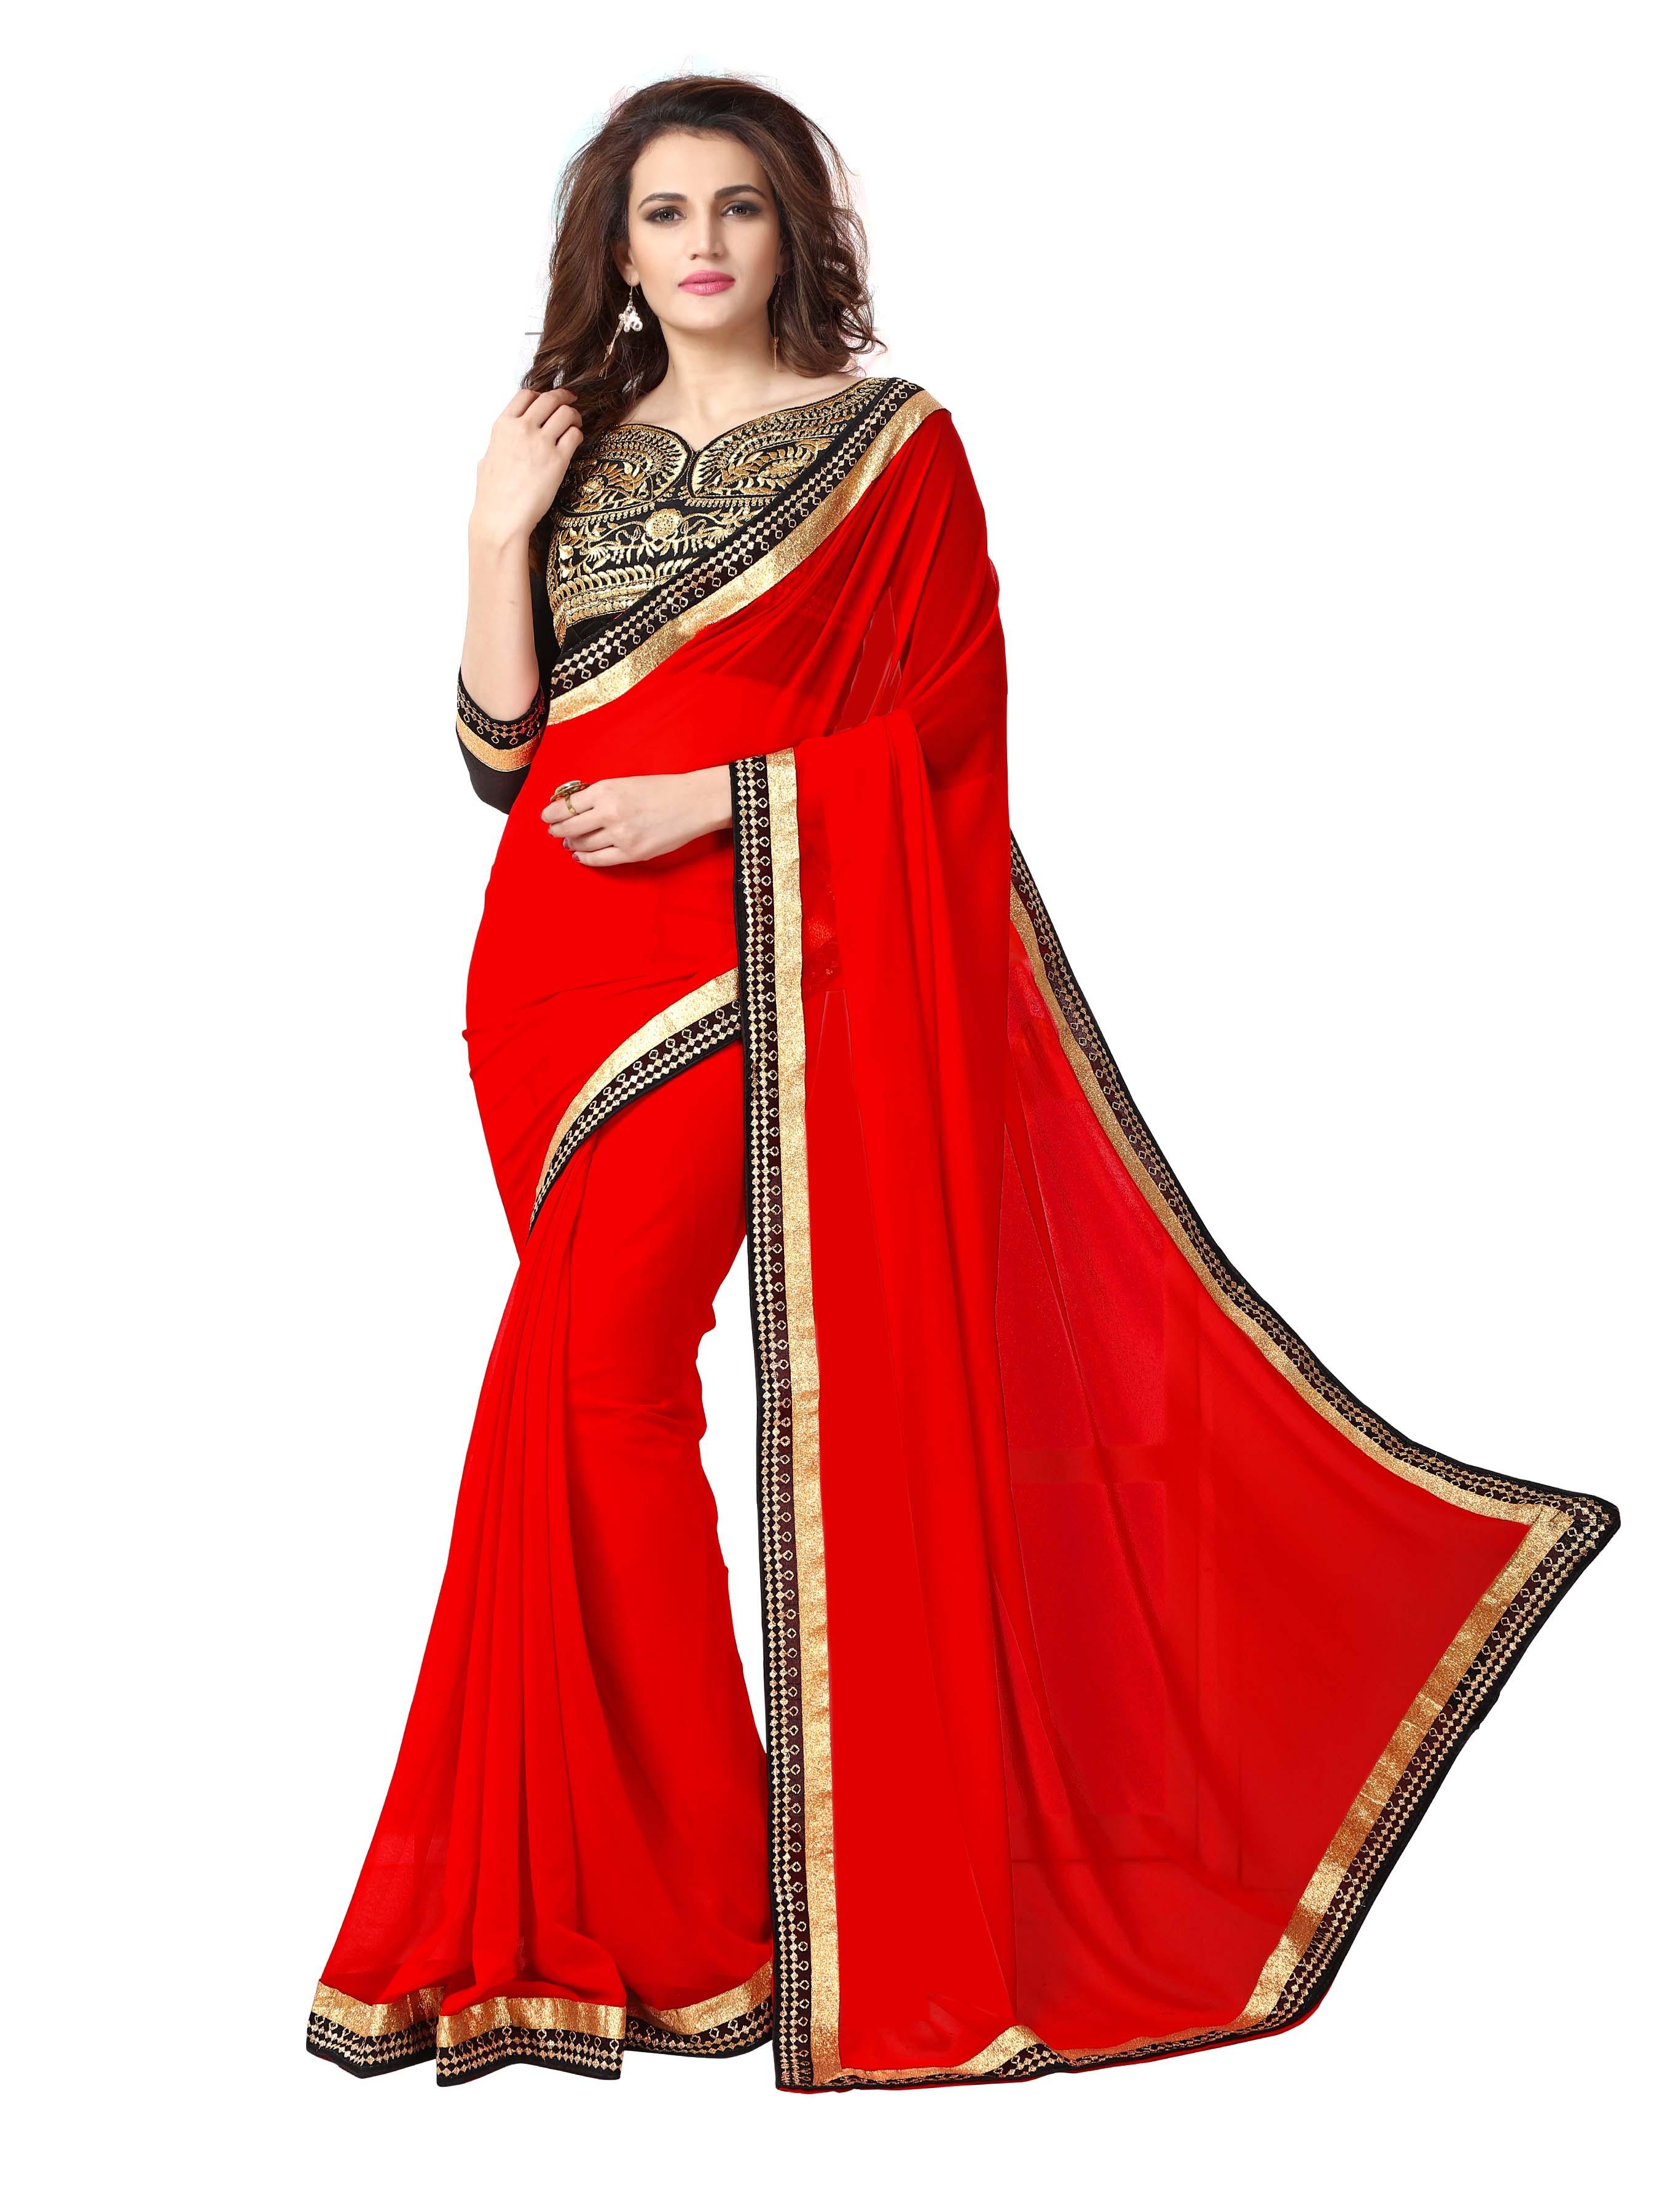 Deals - Bangalore - Under ₹699 <br> Chiffon & Georgette Sarees<br> Category - clothing<br> Business - Flipkart.com